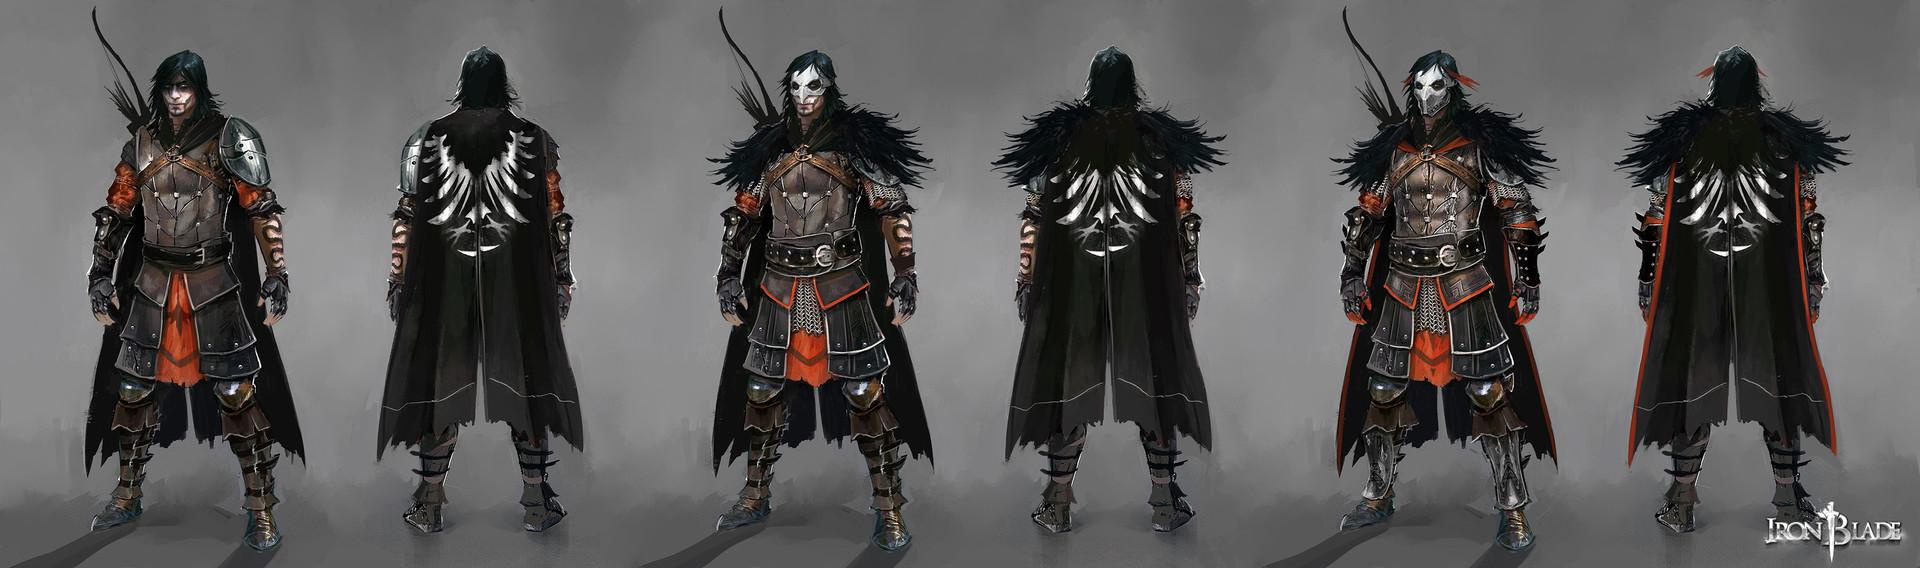 Alexandre chaudret hf armorset armors03